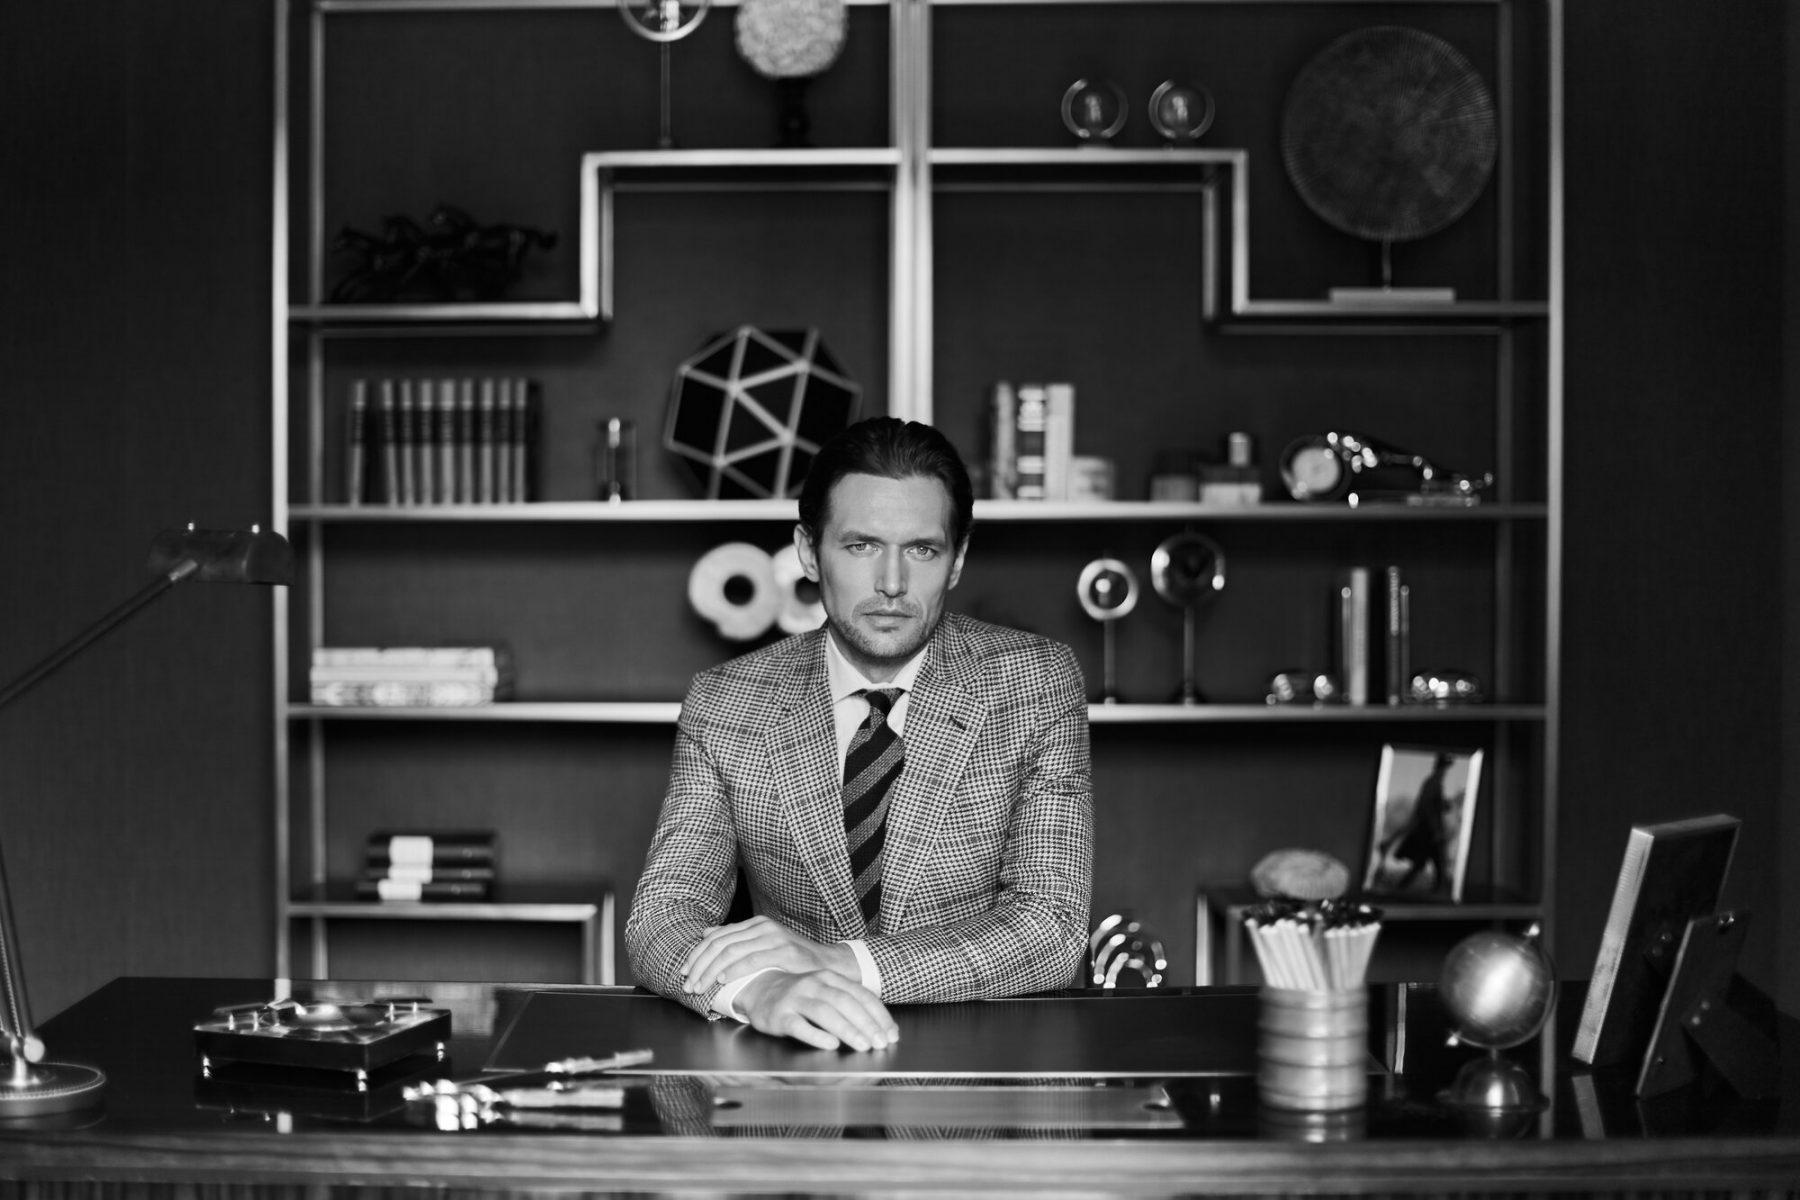 Savile Row Tailors | Mens Suit Tailors & Tailoring in London - Huntsman Savile Row